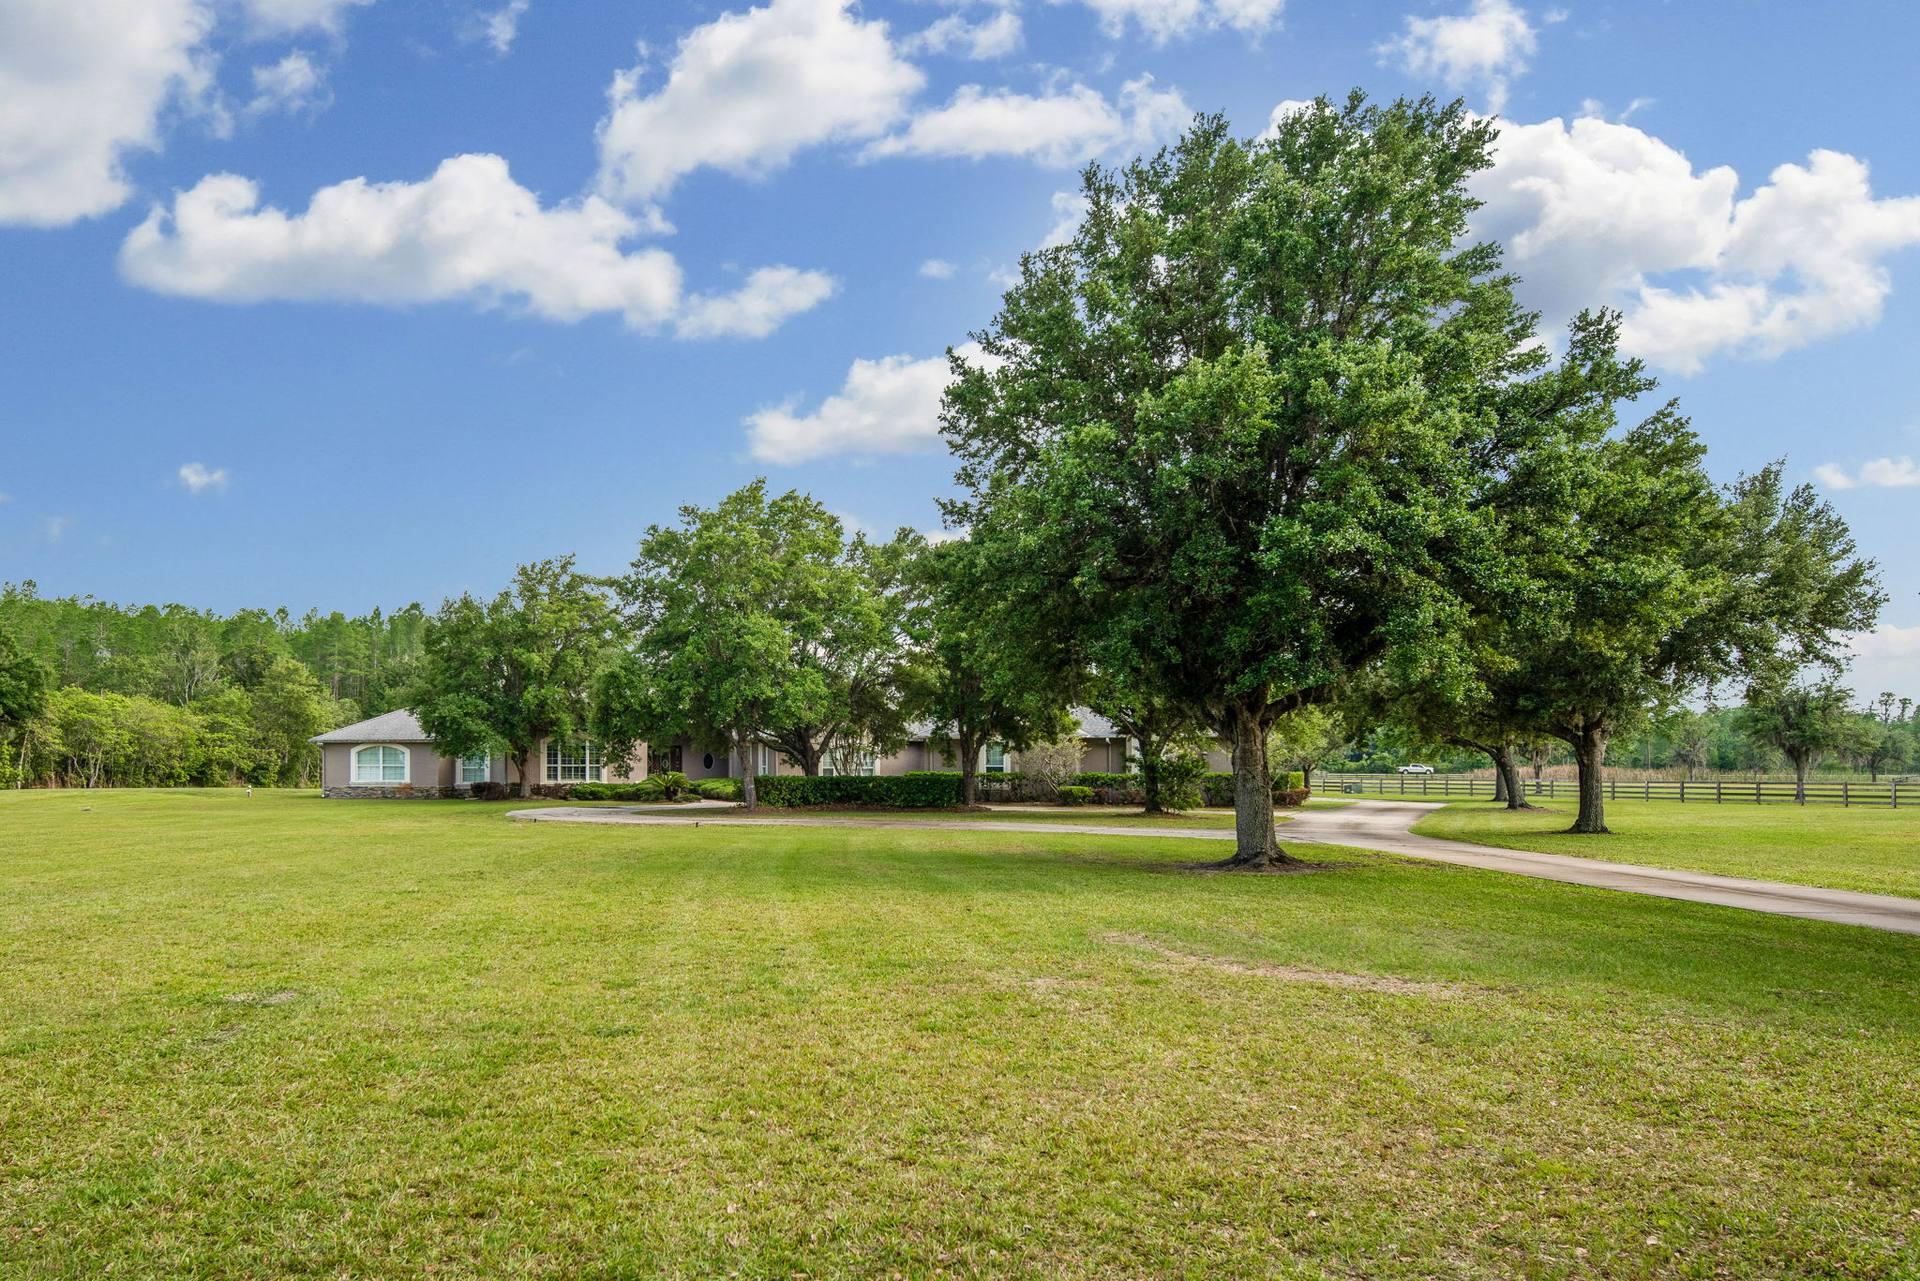 11939 Pasco Trails Blvd, Spring Hill, FL 34610, US